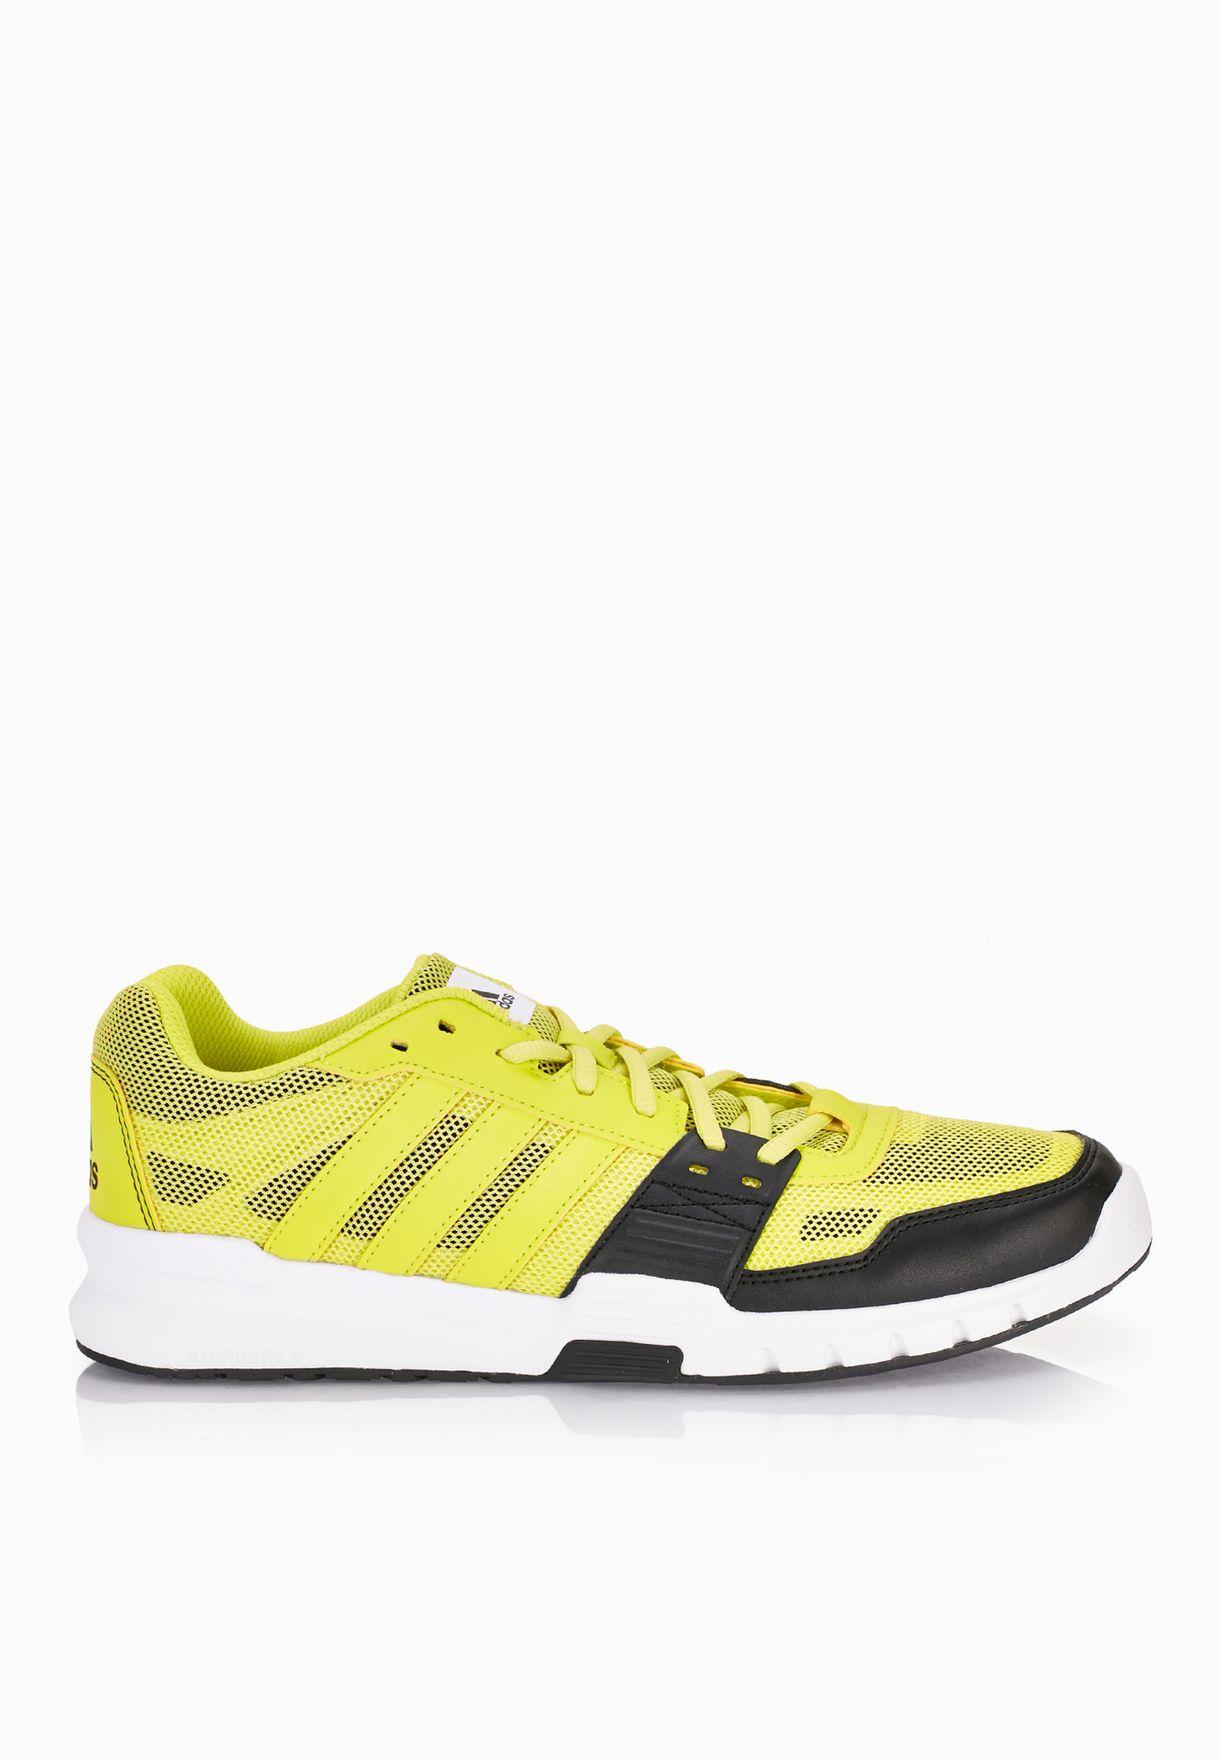 buy popular bae28 5e4de Shop adidas yellow Essential Star .2 BB3778 for Men in Saudi - AD476SH35PVS